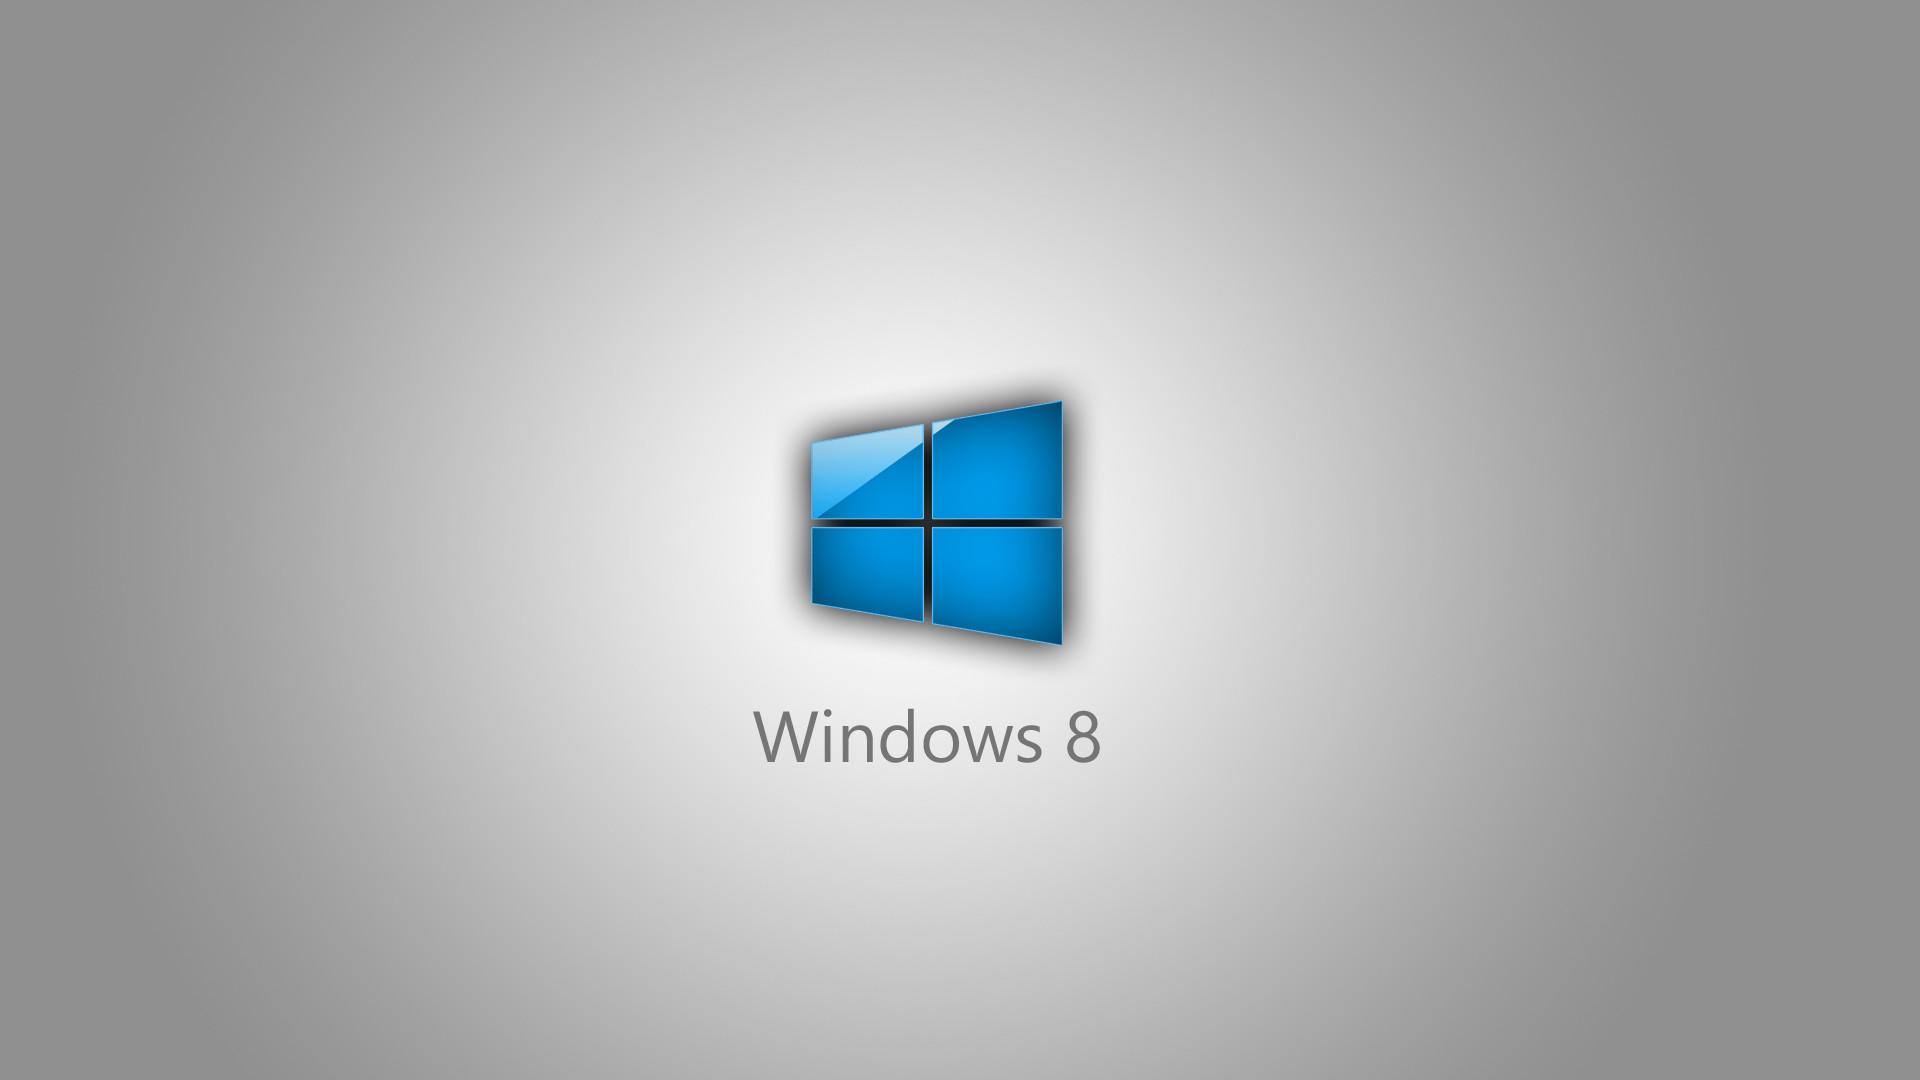 1920x1080 Windows 81 Pro Wallpaper Isnt Half Bad